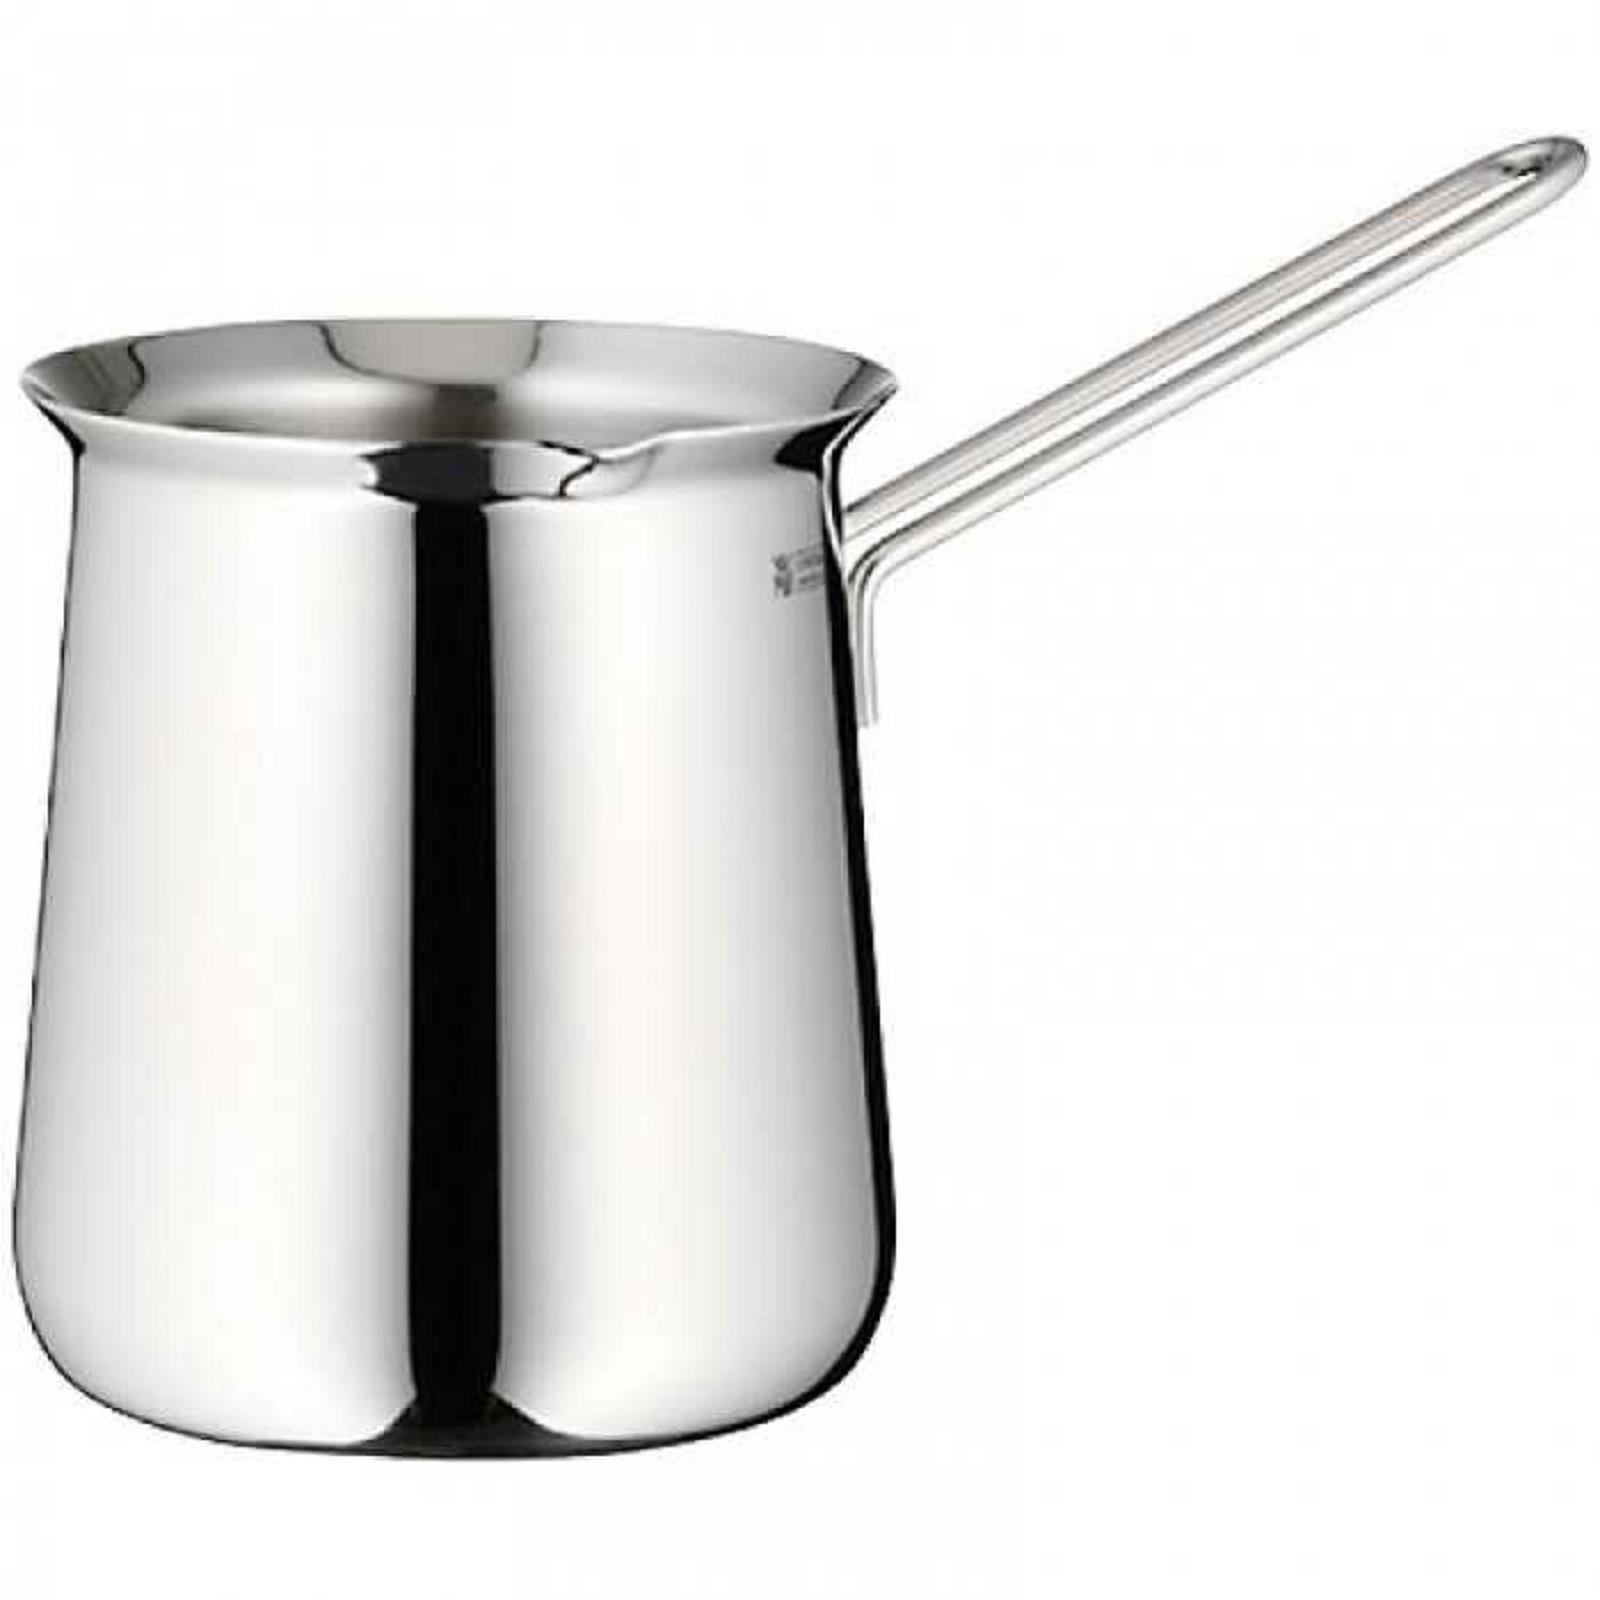 Онлайн каталог PROMENU: Турка для кофе WMF GRAND GOURMET, объем 0,68 л, серебристый WMF 06 4712 6040